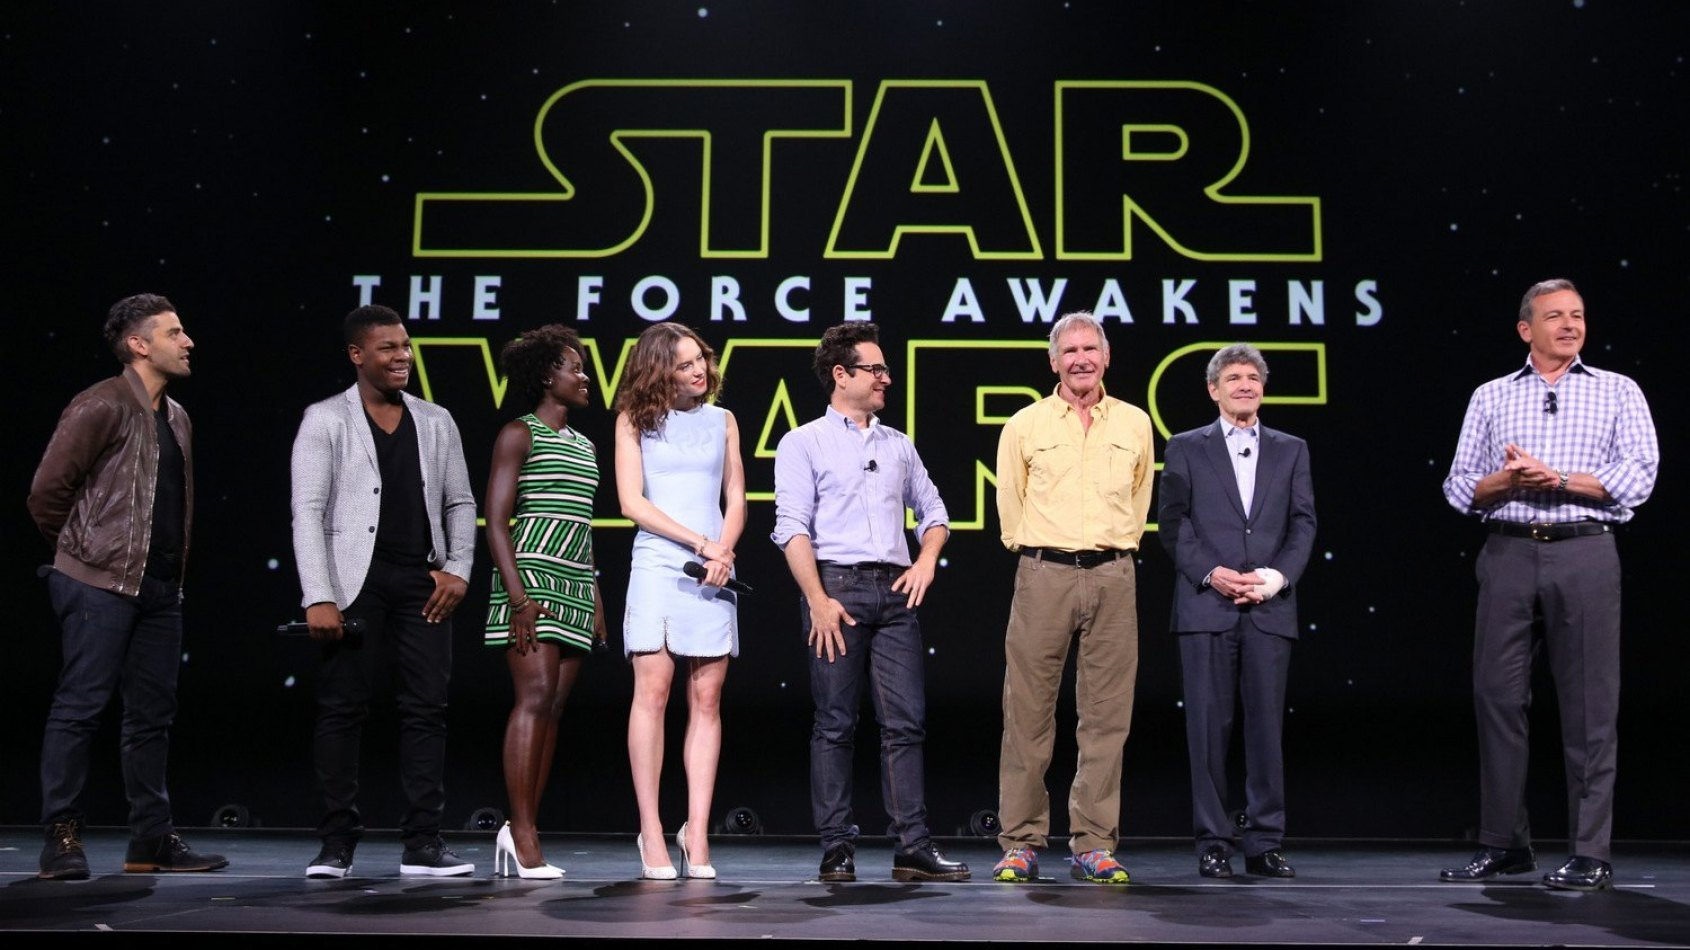 Star Wars continuera au cin�ma apr�s 2021 !